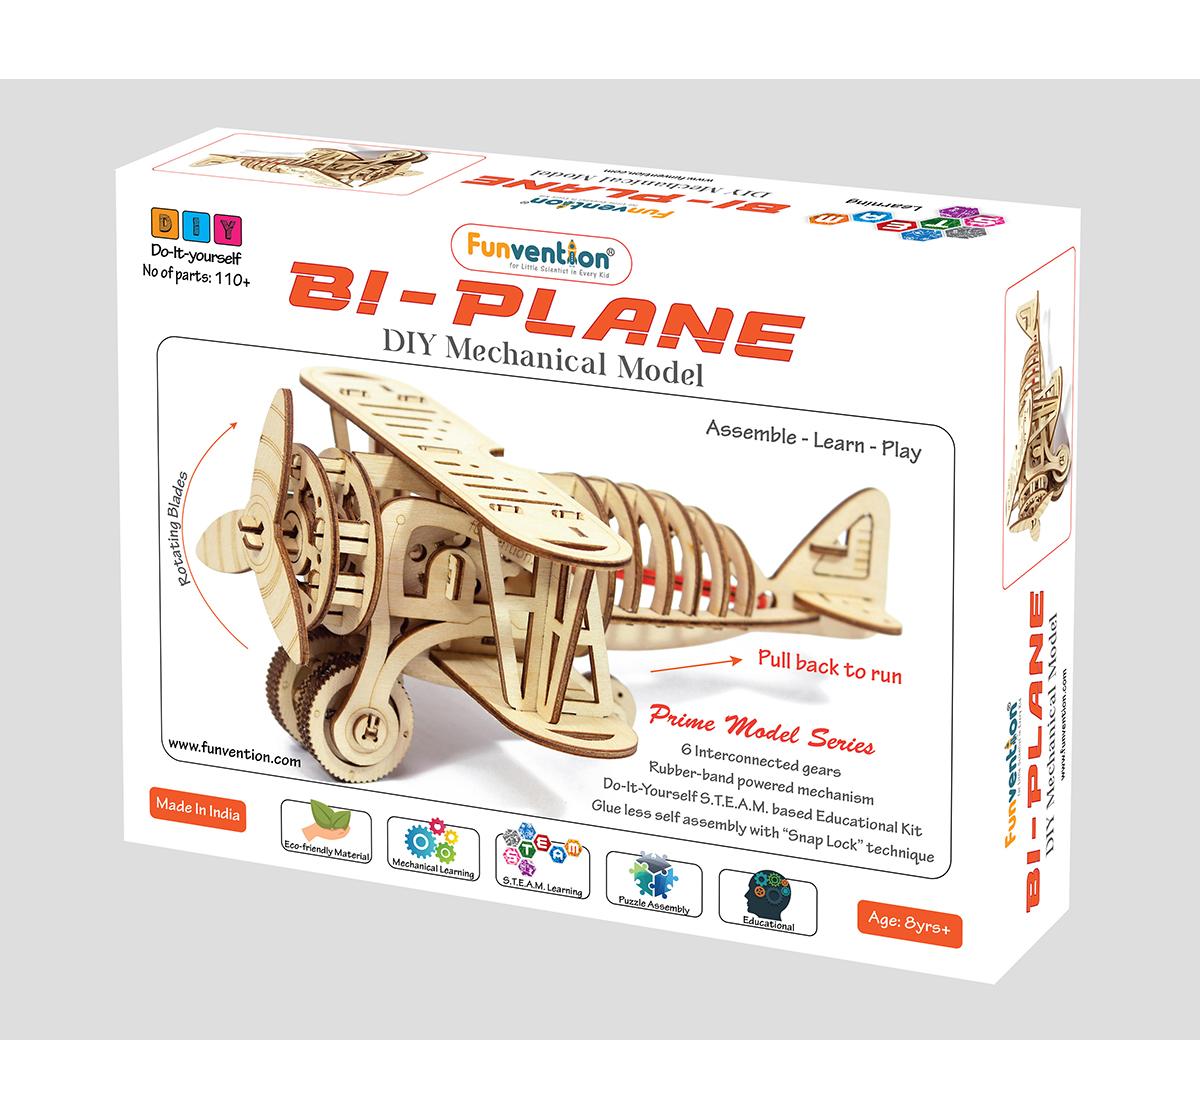 Funvention | Funvention Bi-Plane - Diy Mechanical Model (Prime Series) Stem for Kids Age 8Y+